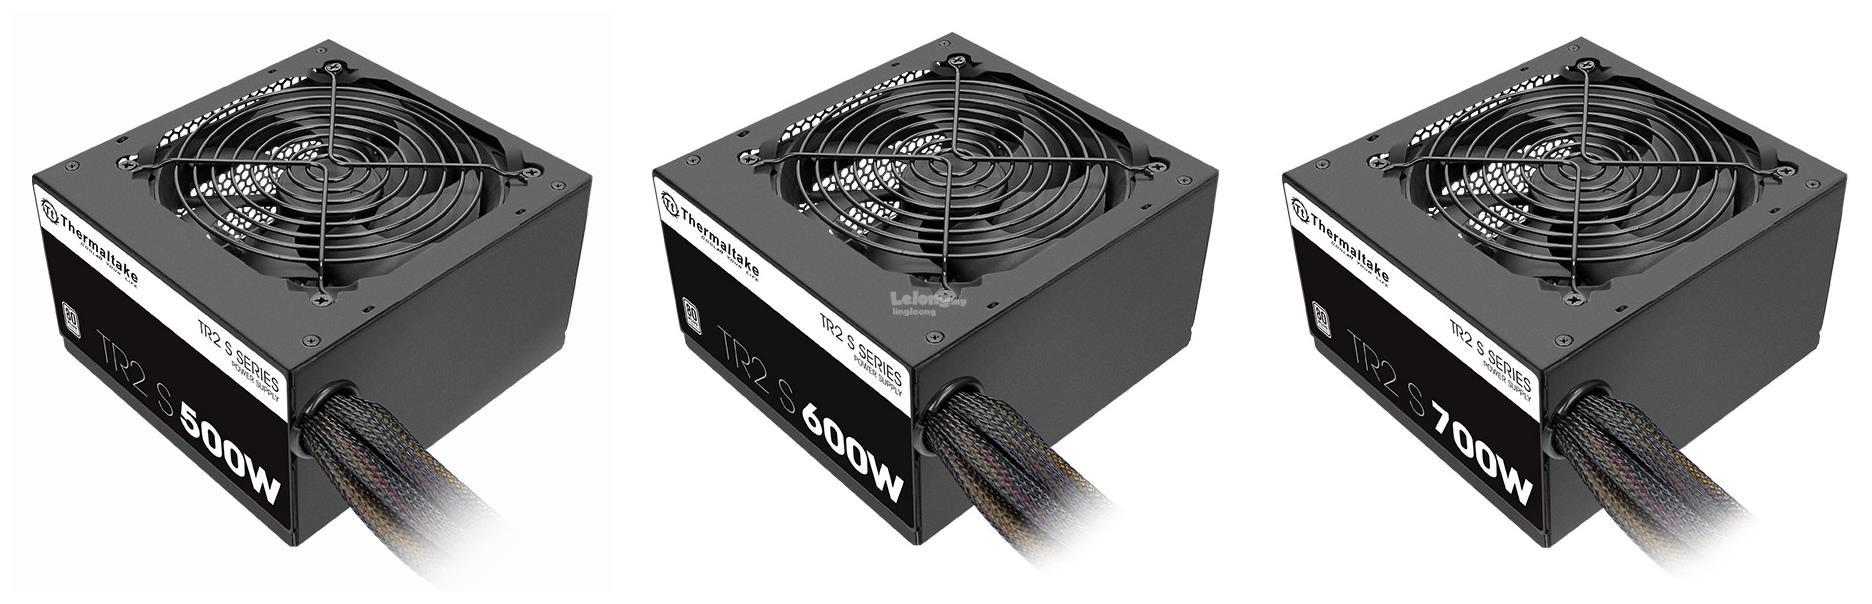 # THERMALTAKE TR2 S 80+ White Power Supply Series # 500W/600W/700W